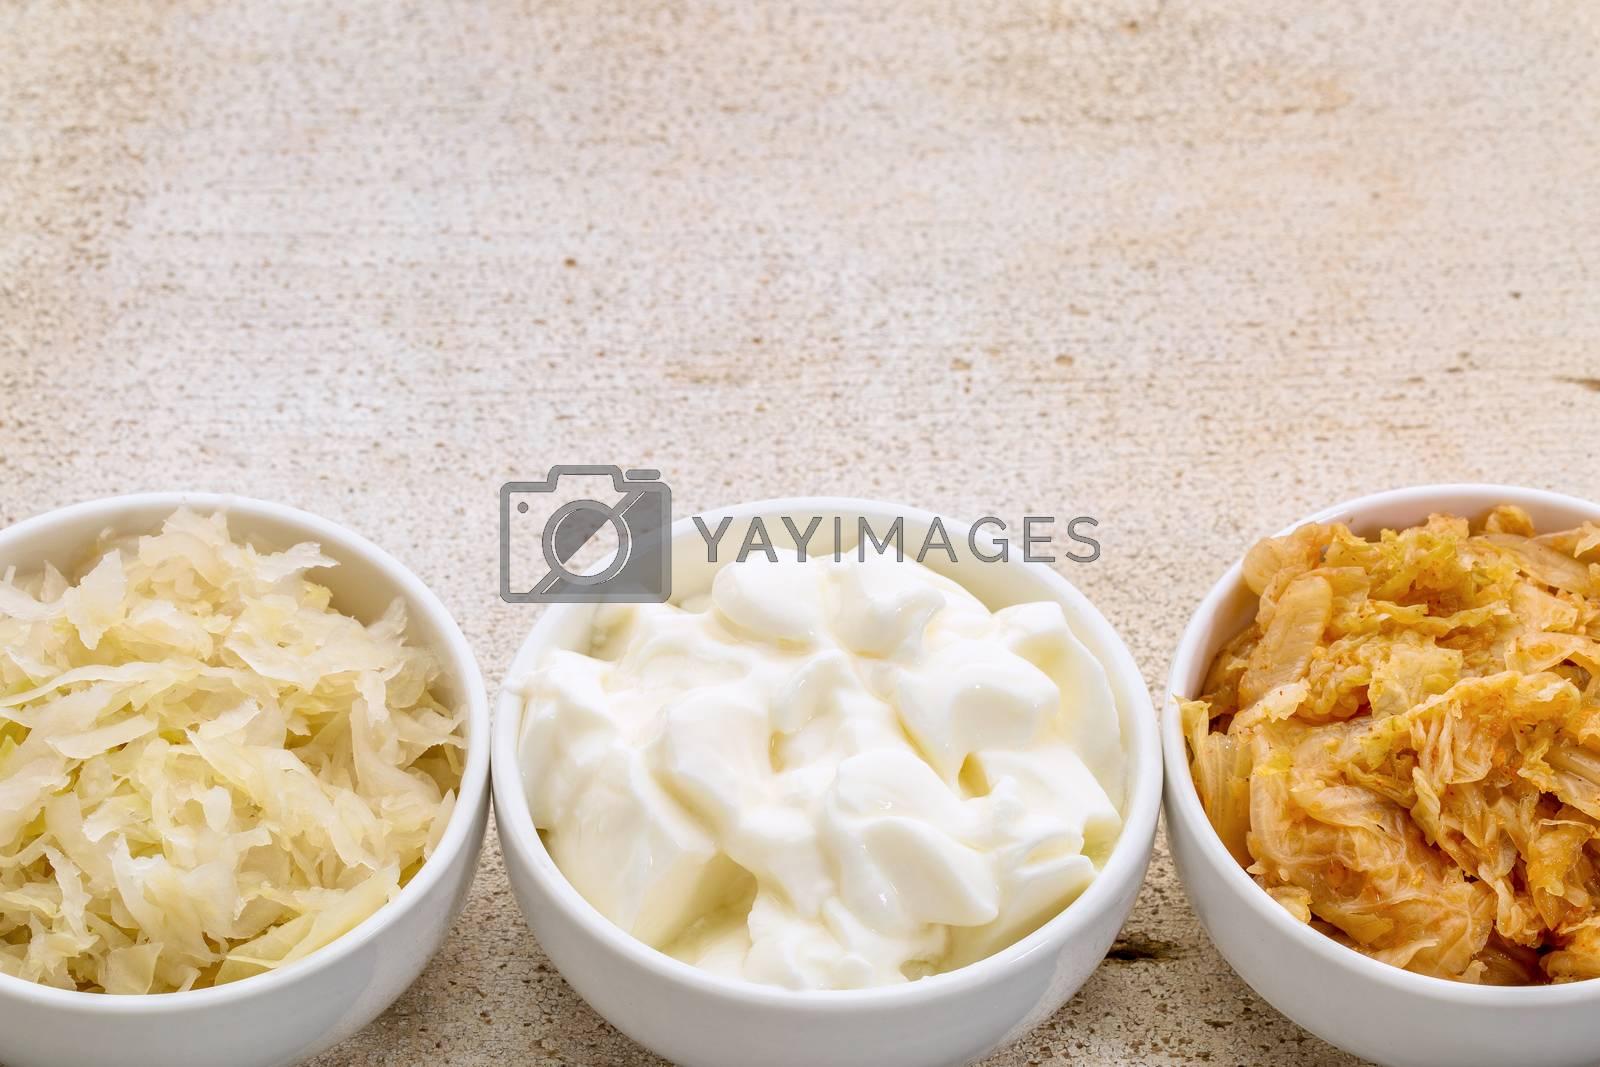 sauerkraut, kimchi and yogurt - popular probiotic fermented food - three ceramic bowl against rustic wood with a copy space